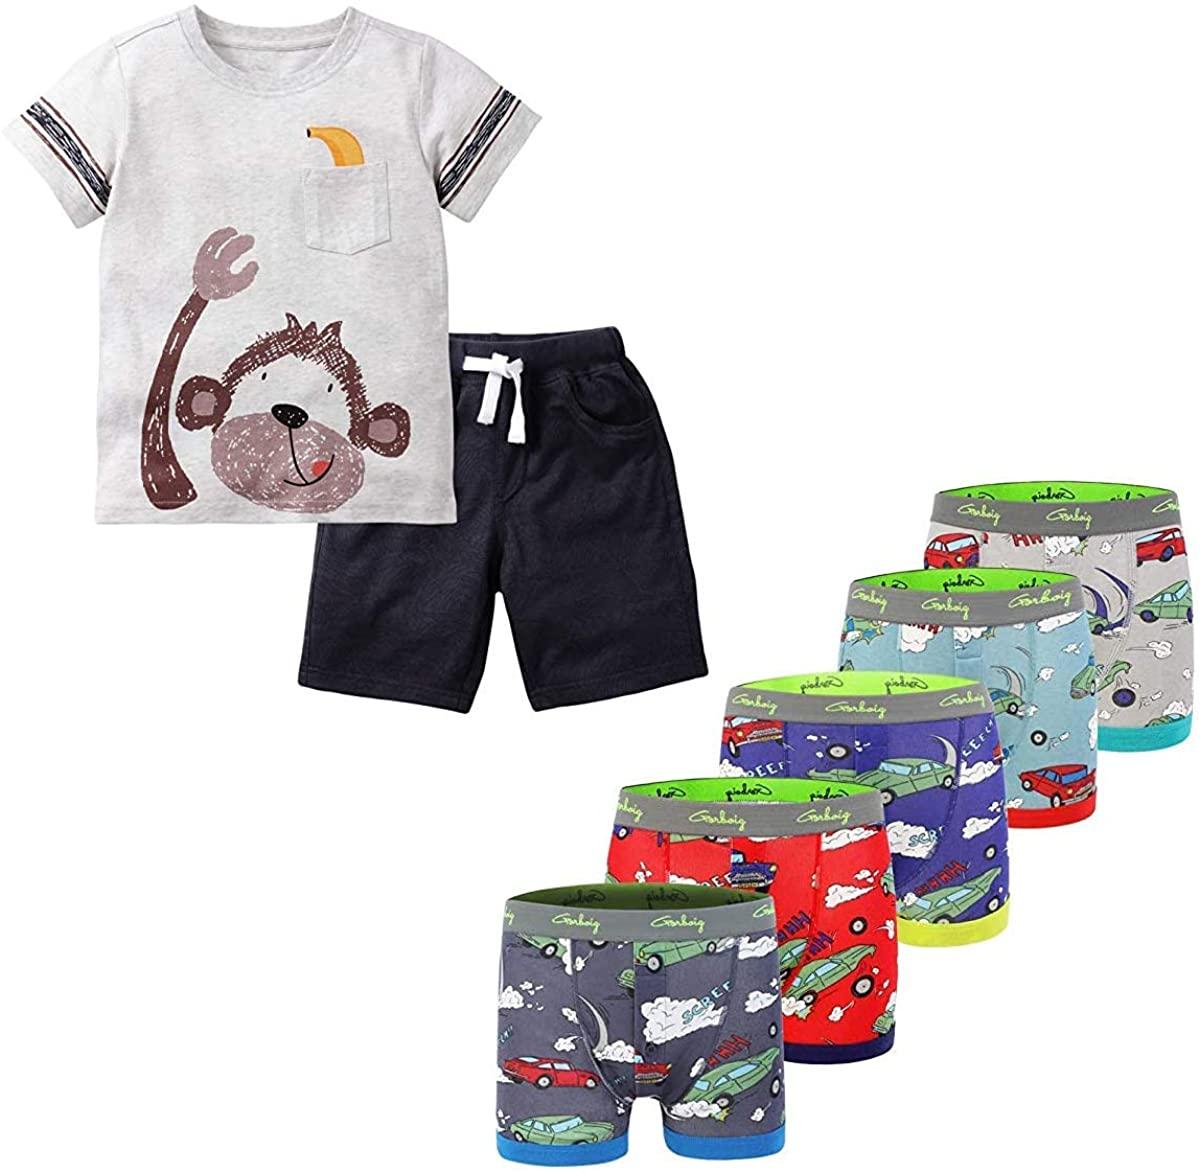 Gorboig Toddler Boy Clothes 6T Summer Outfits Short Sleeve Monkey Clothing Set T-Shirt&Shorts & Dinosaur Underwear